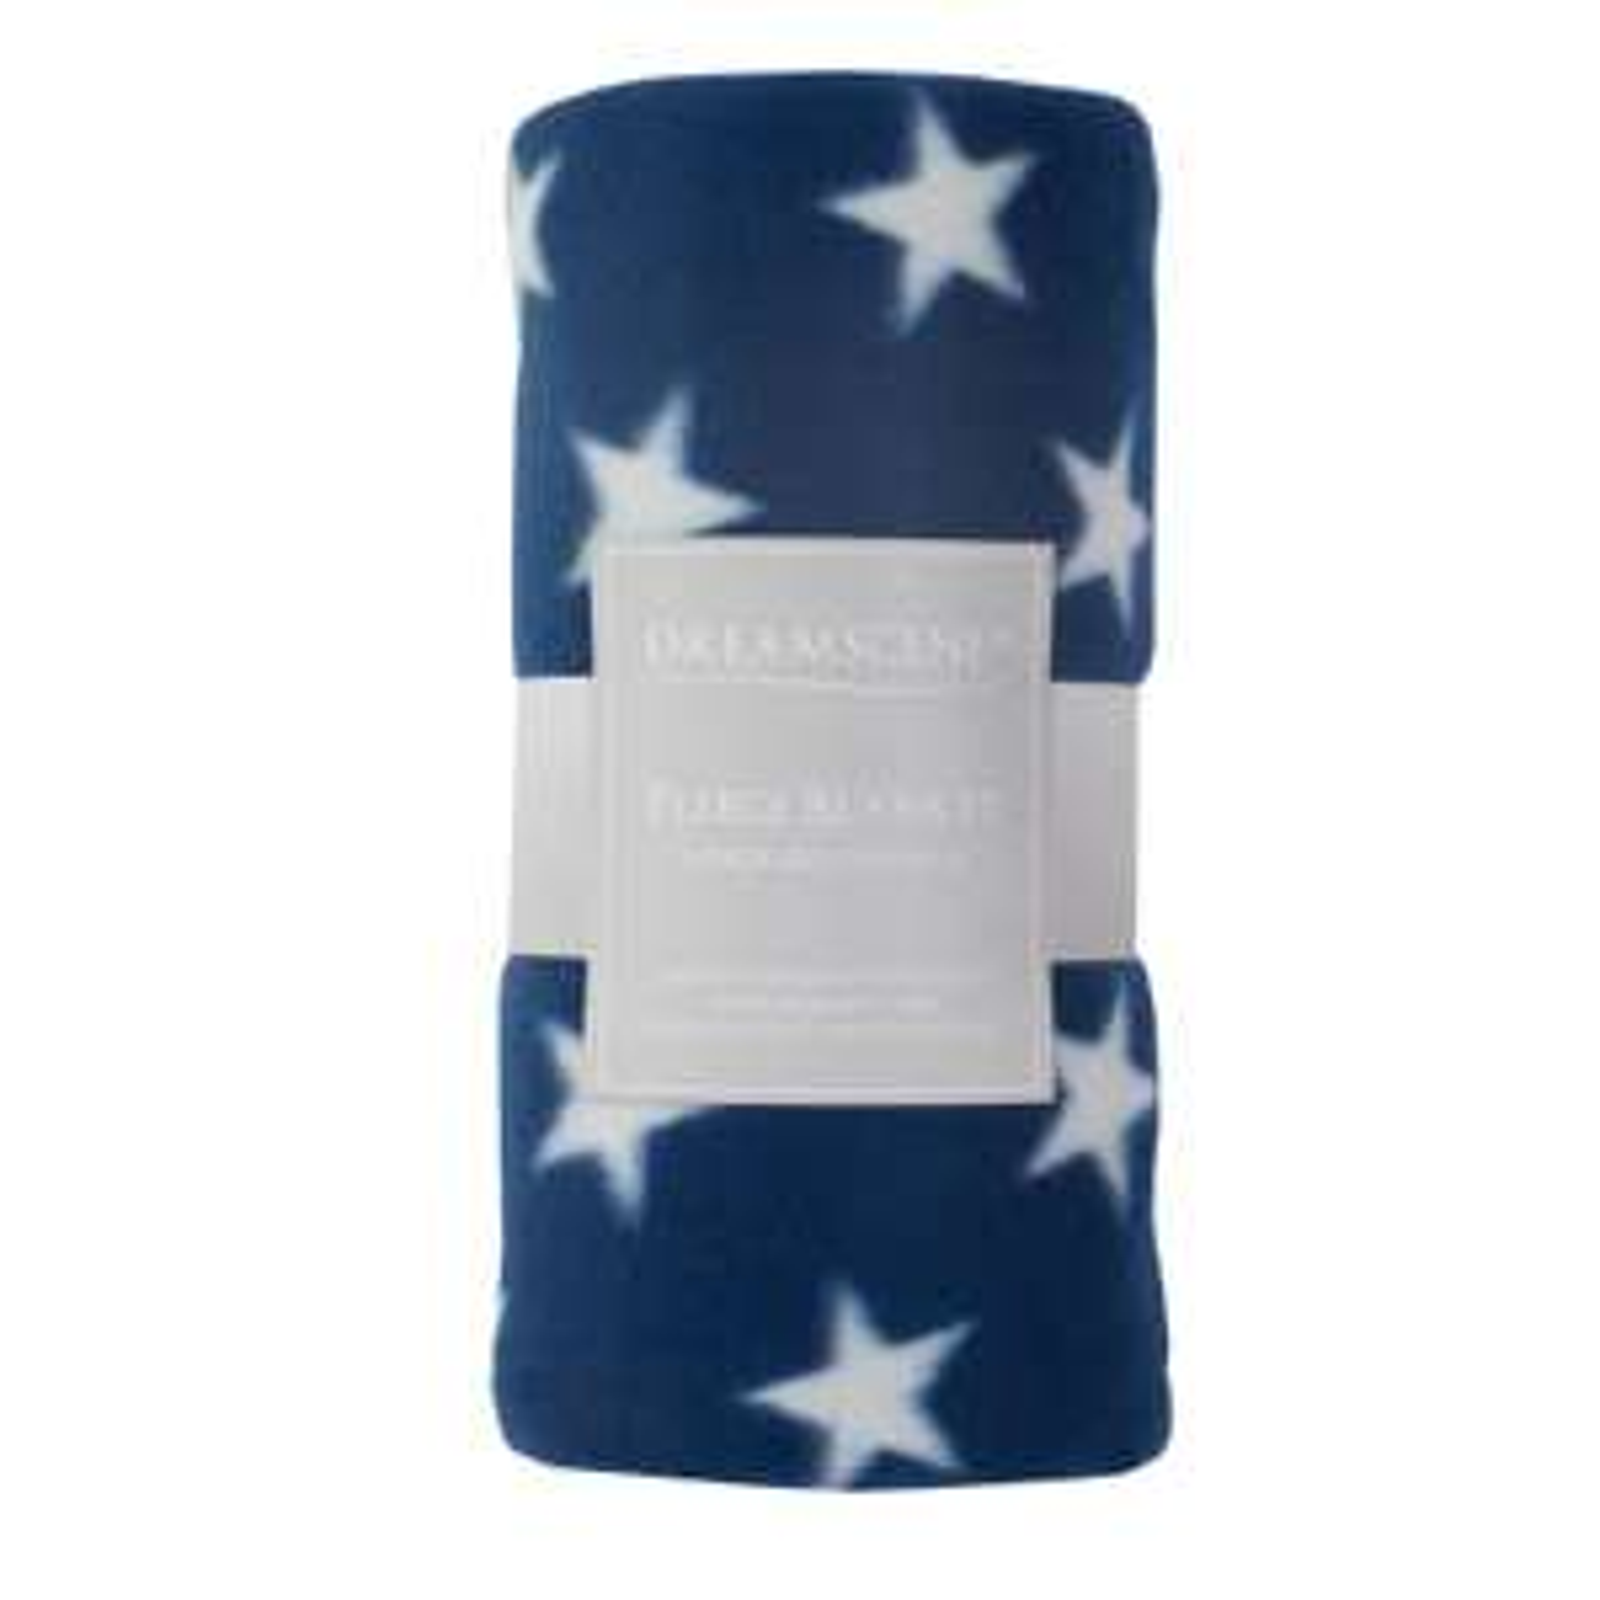 Dreamscene Stars Throw Over Bed Warm Soft Blanket Sofa Winter Fleece Navy Blue - £5.99 @ onlinehomeshop / eBay